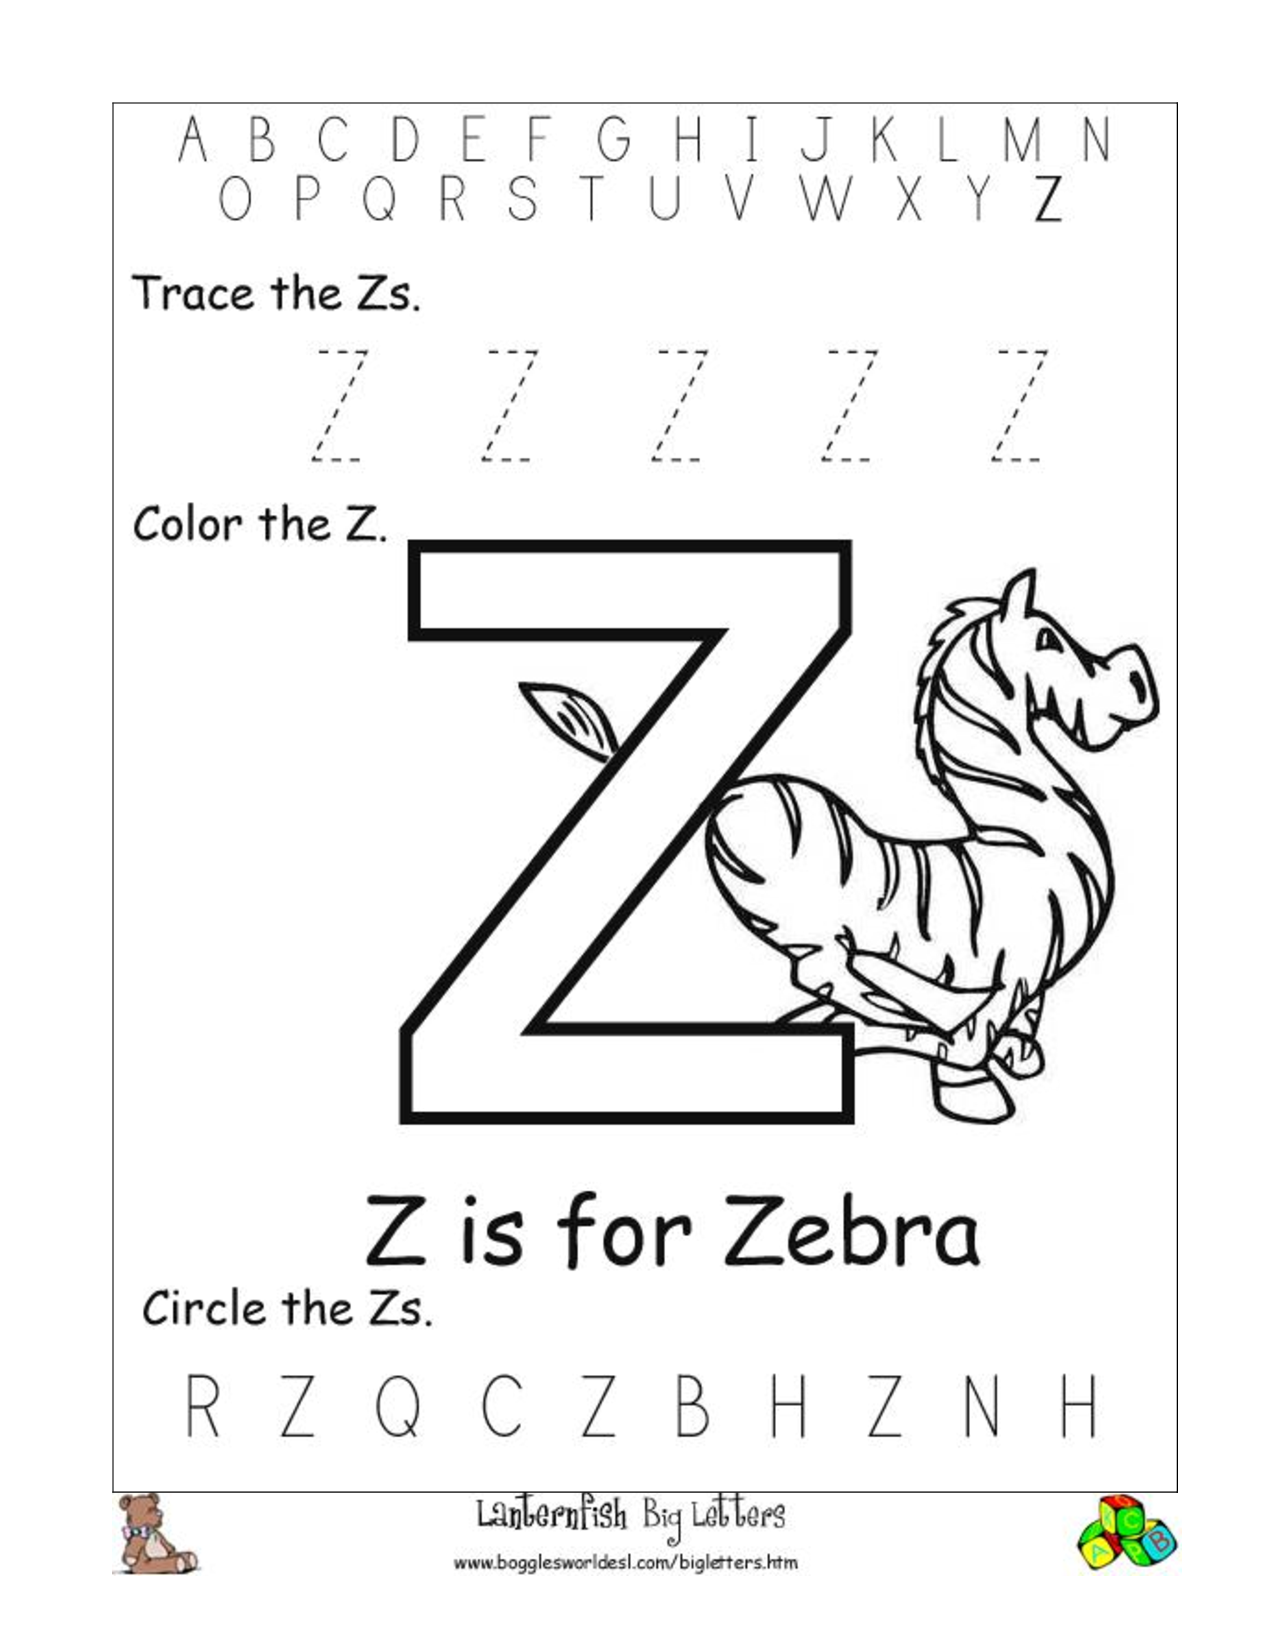 Worksheets Letter A Worksheets For Preschool alphabet worksheets for preschoolers worksheet big letter 2749dade4e794615a526e99f03963a2d jpg preschool preschoolers